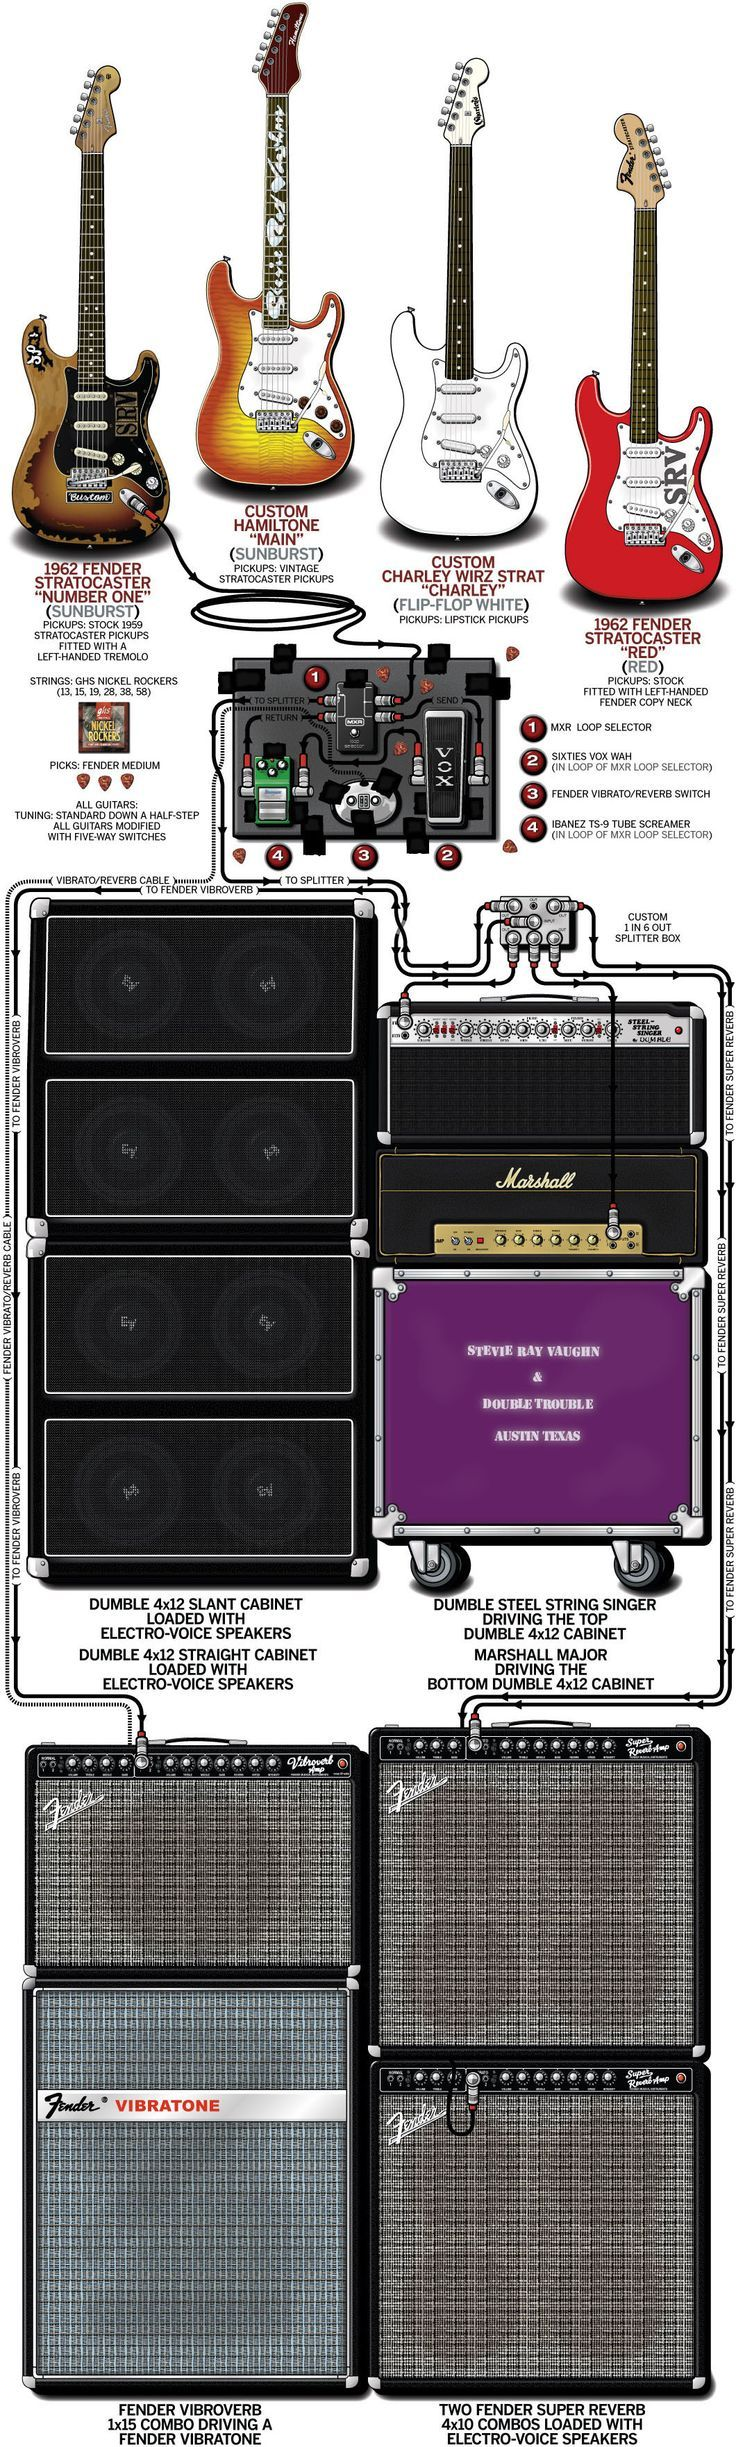 Dumble Speaker Cabinet 1100 Best Images About Amps On Pinterest Marshalls Joe Satriani